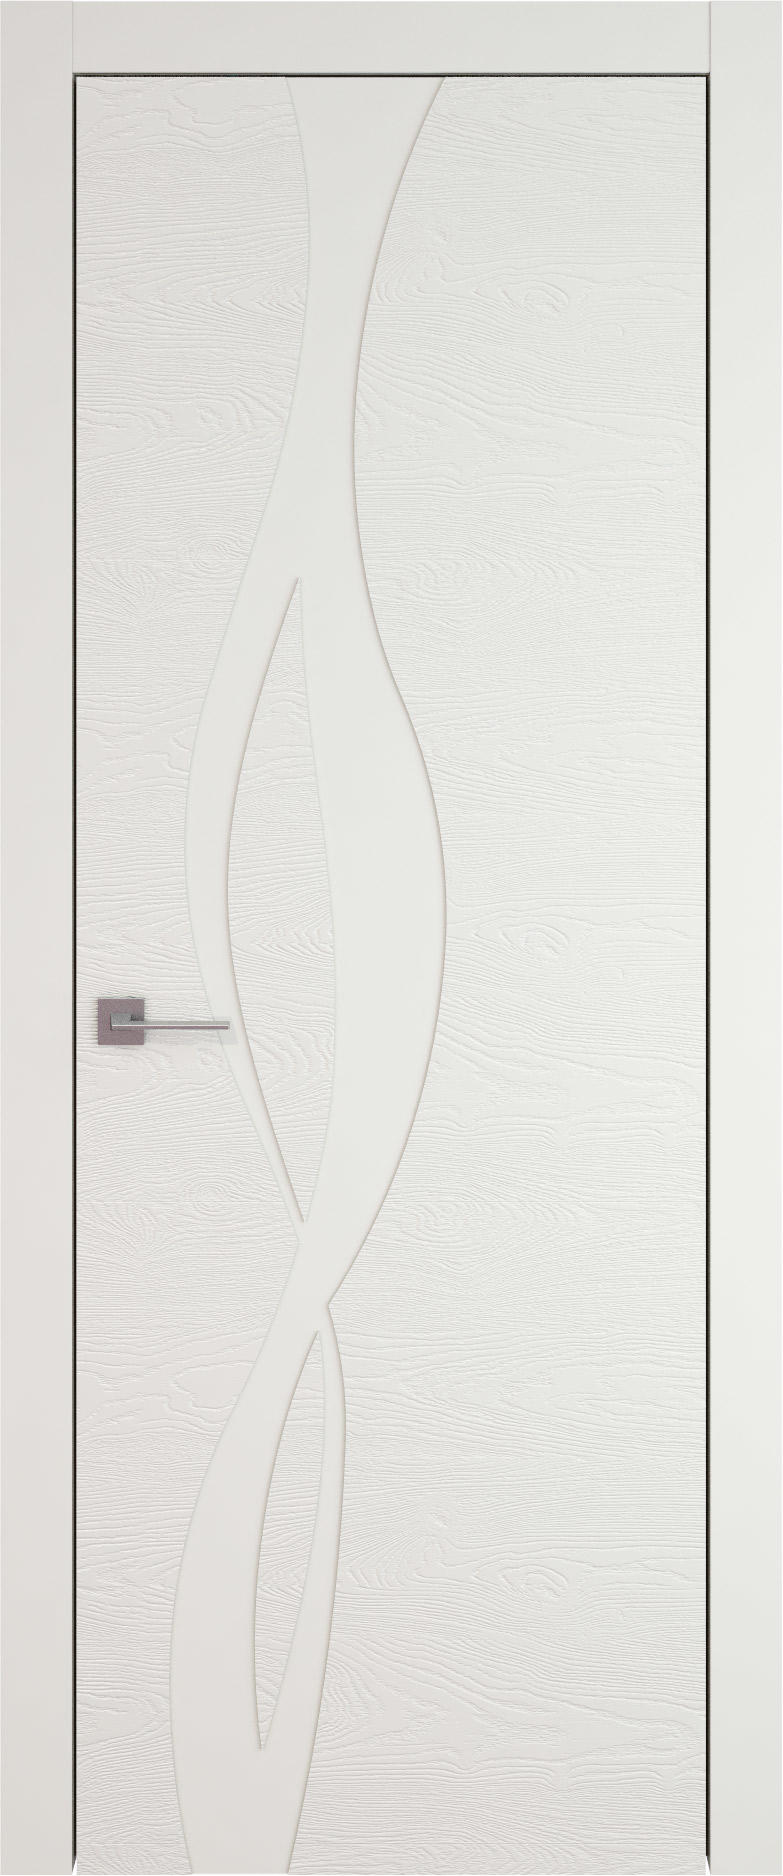 Tivoli Г-5 цвет - Бежевая эмаль по шпону (RAL 9010) Без стекла (ДГ)